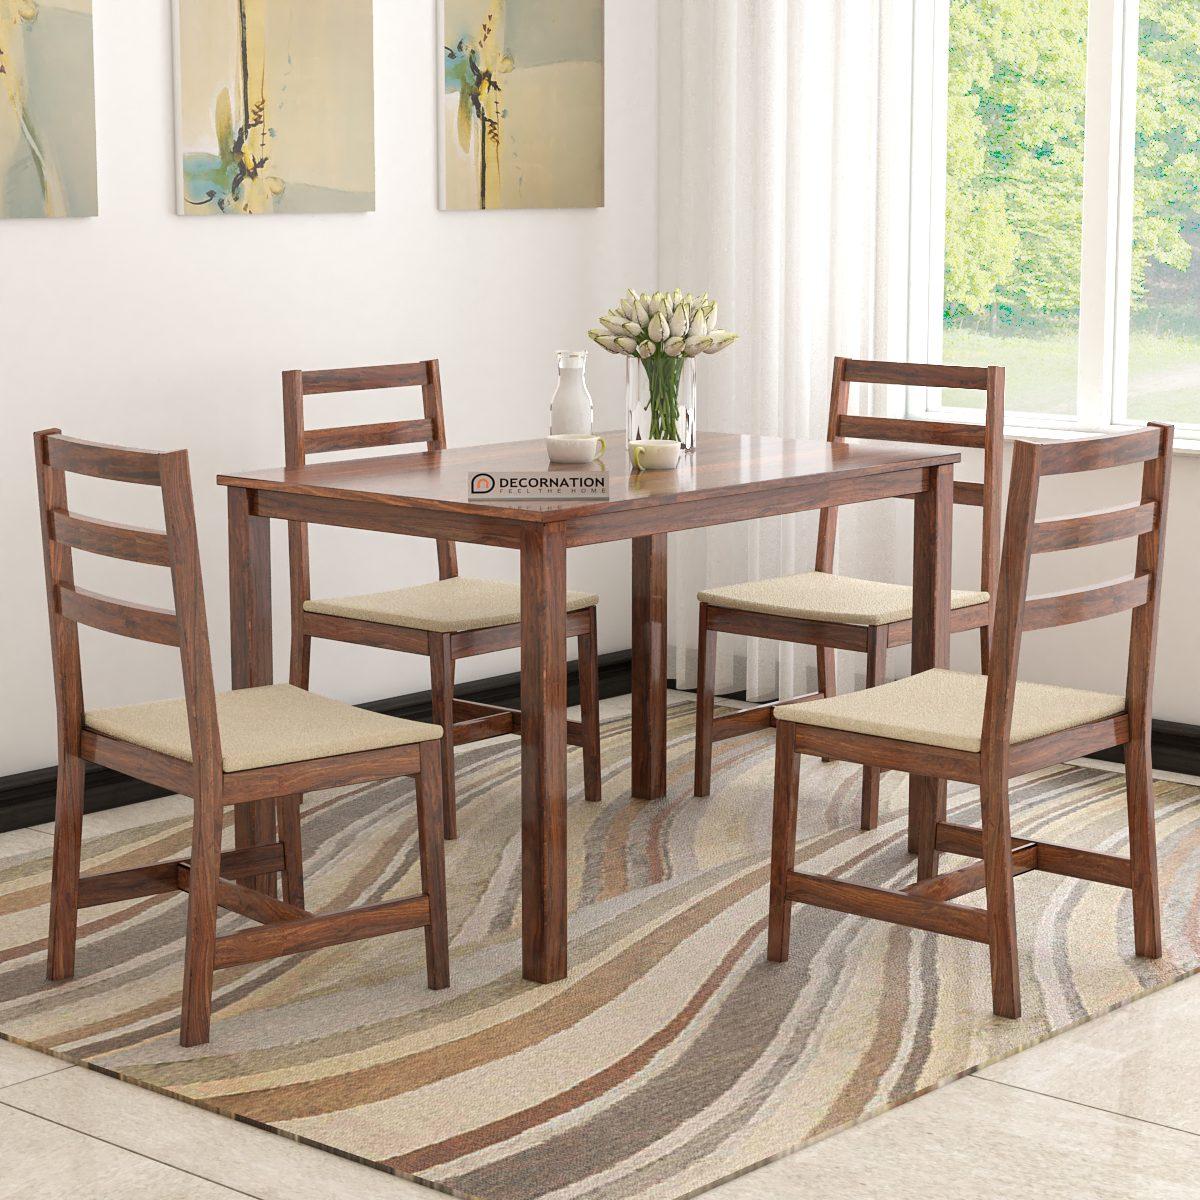 Emilia Solid Wood 4 Seater Dining Table Set Decornation